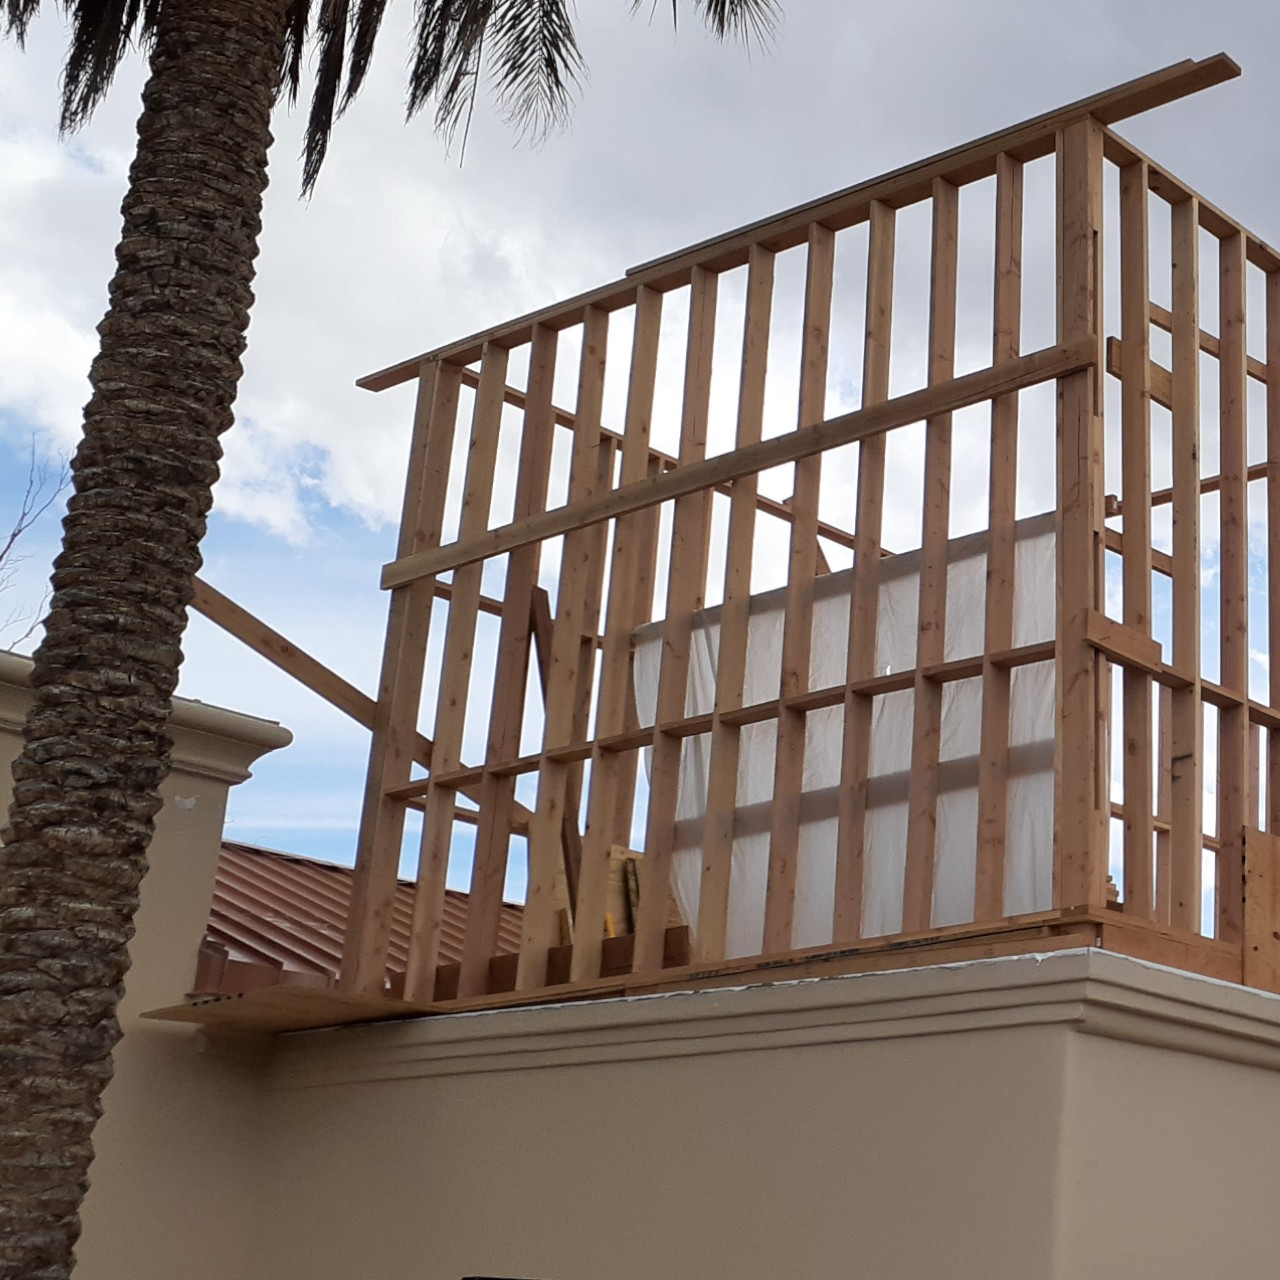 carpentry-wood-framing-second-floor-home-addition--framing-87